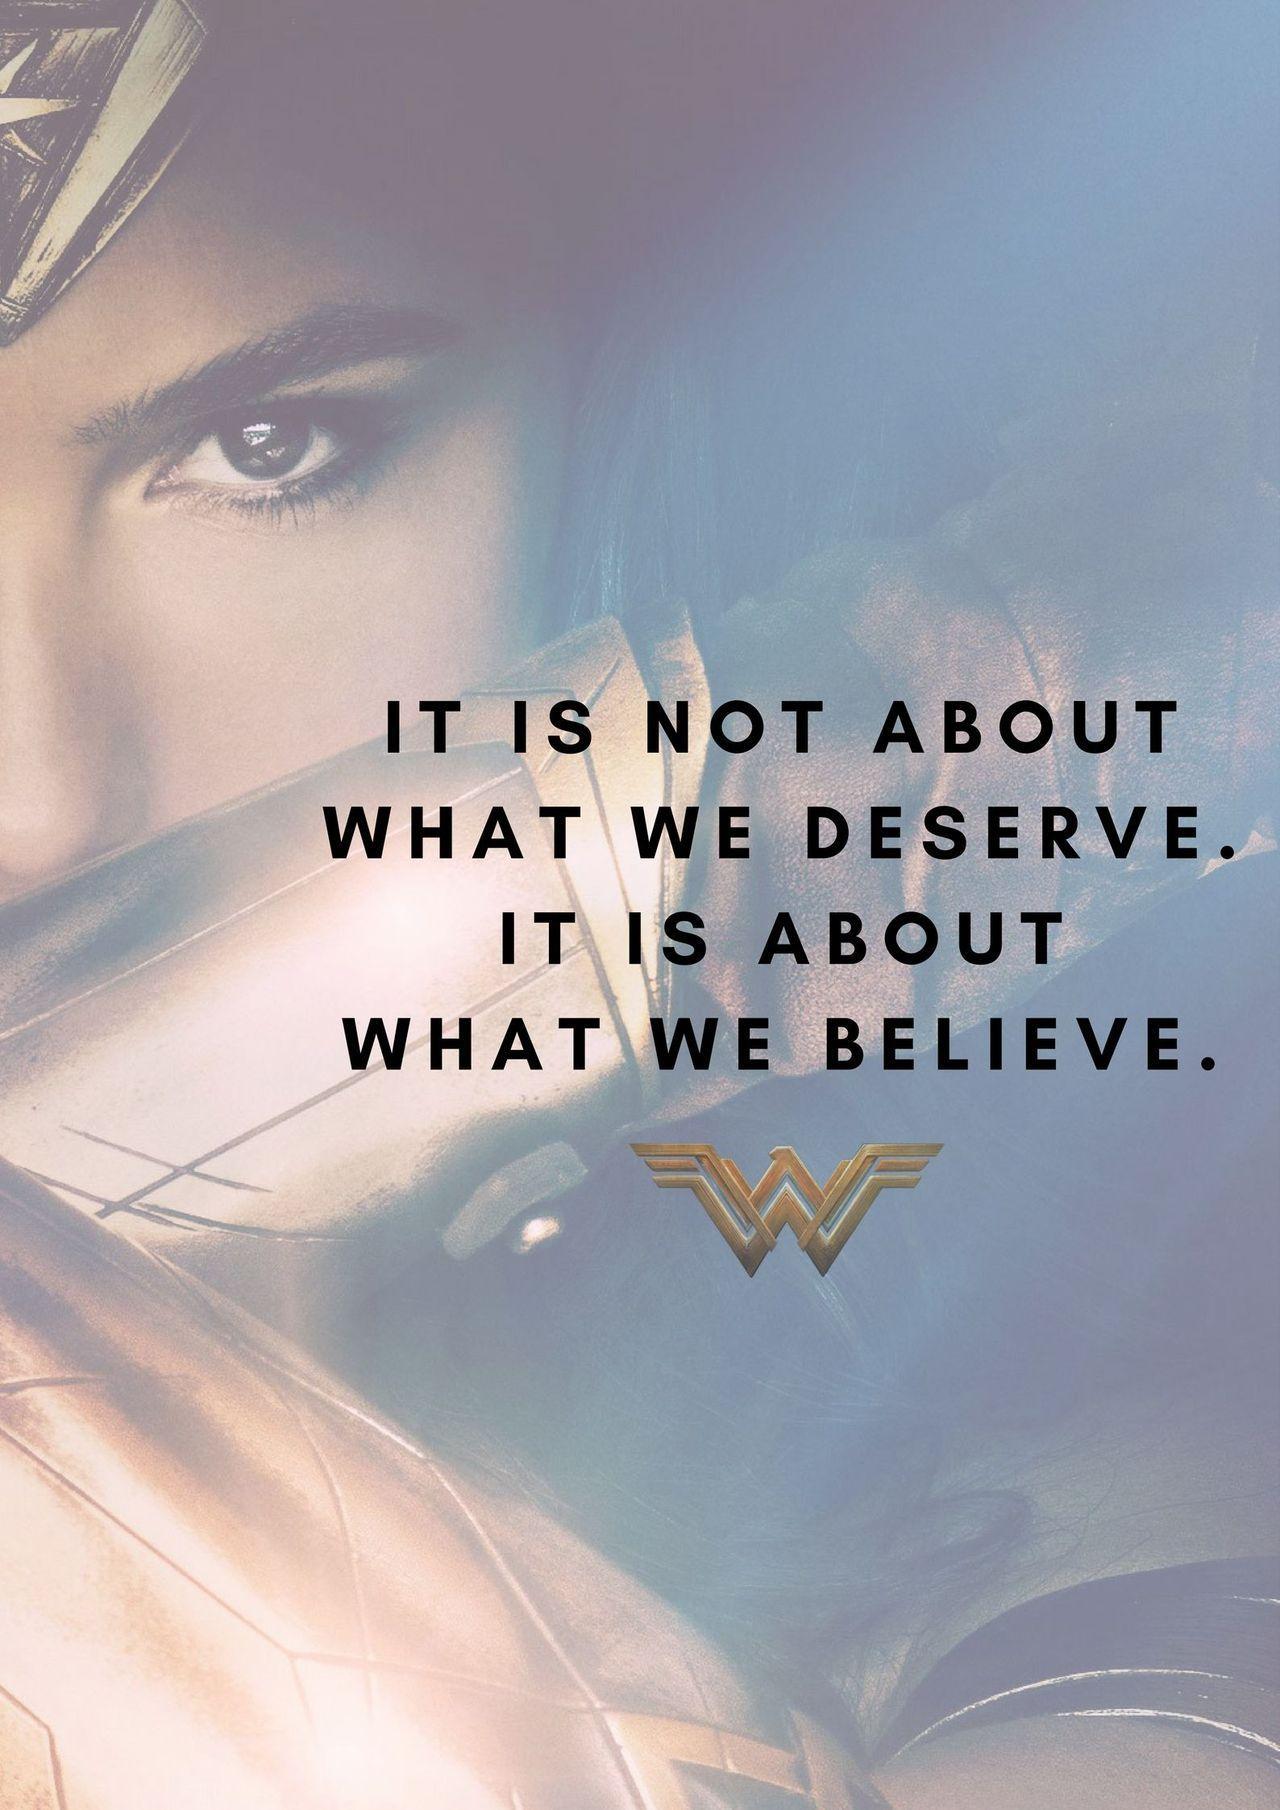 Canada Online Pharmacies Wonder Woman Quotes Woman Quotes Superhero Quotes